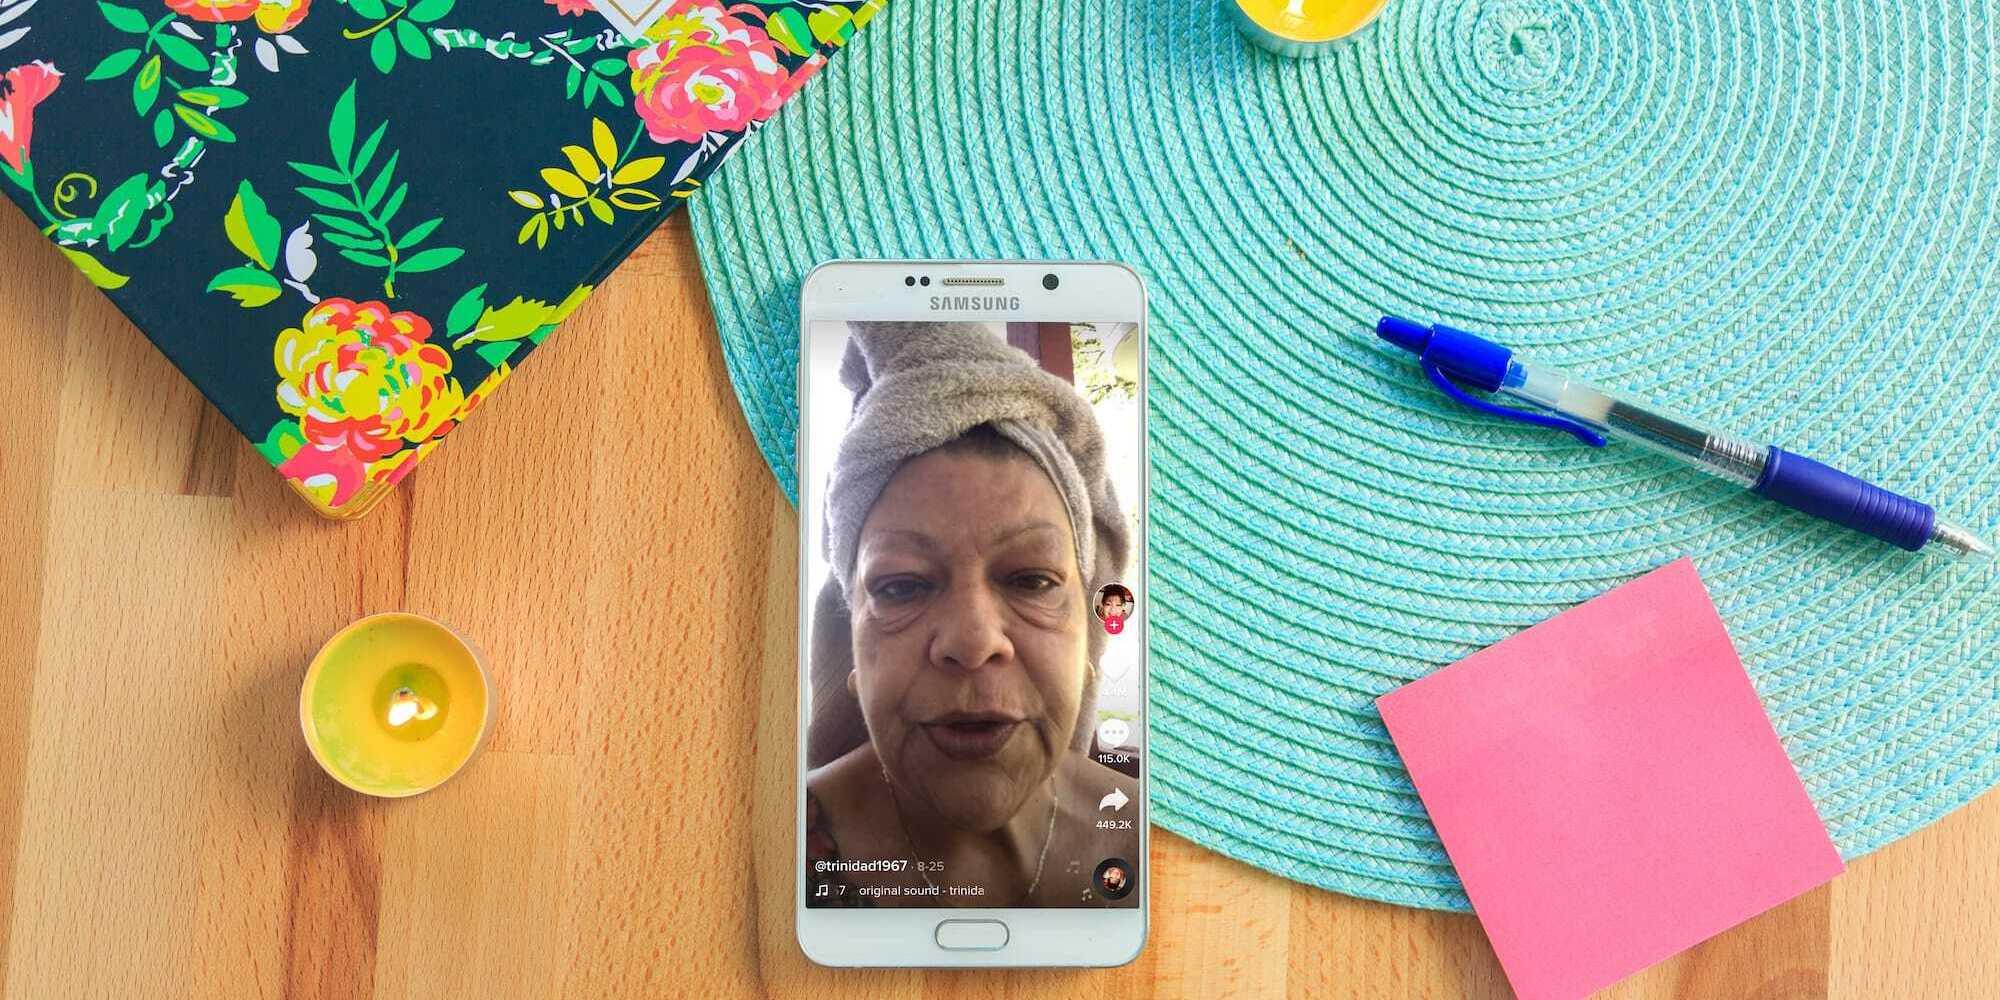 Trinidad Sandoval viral TikTok video